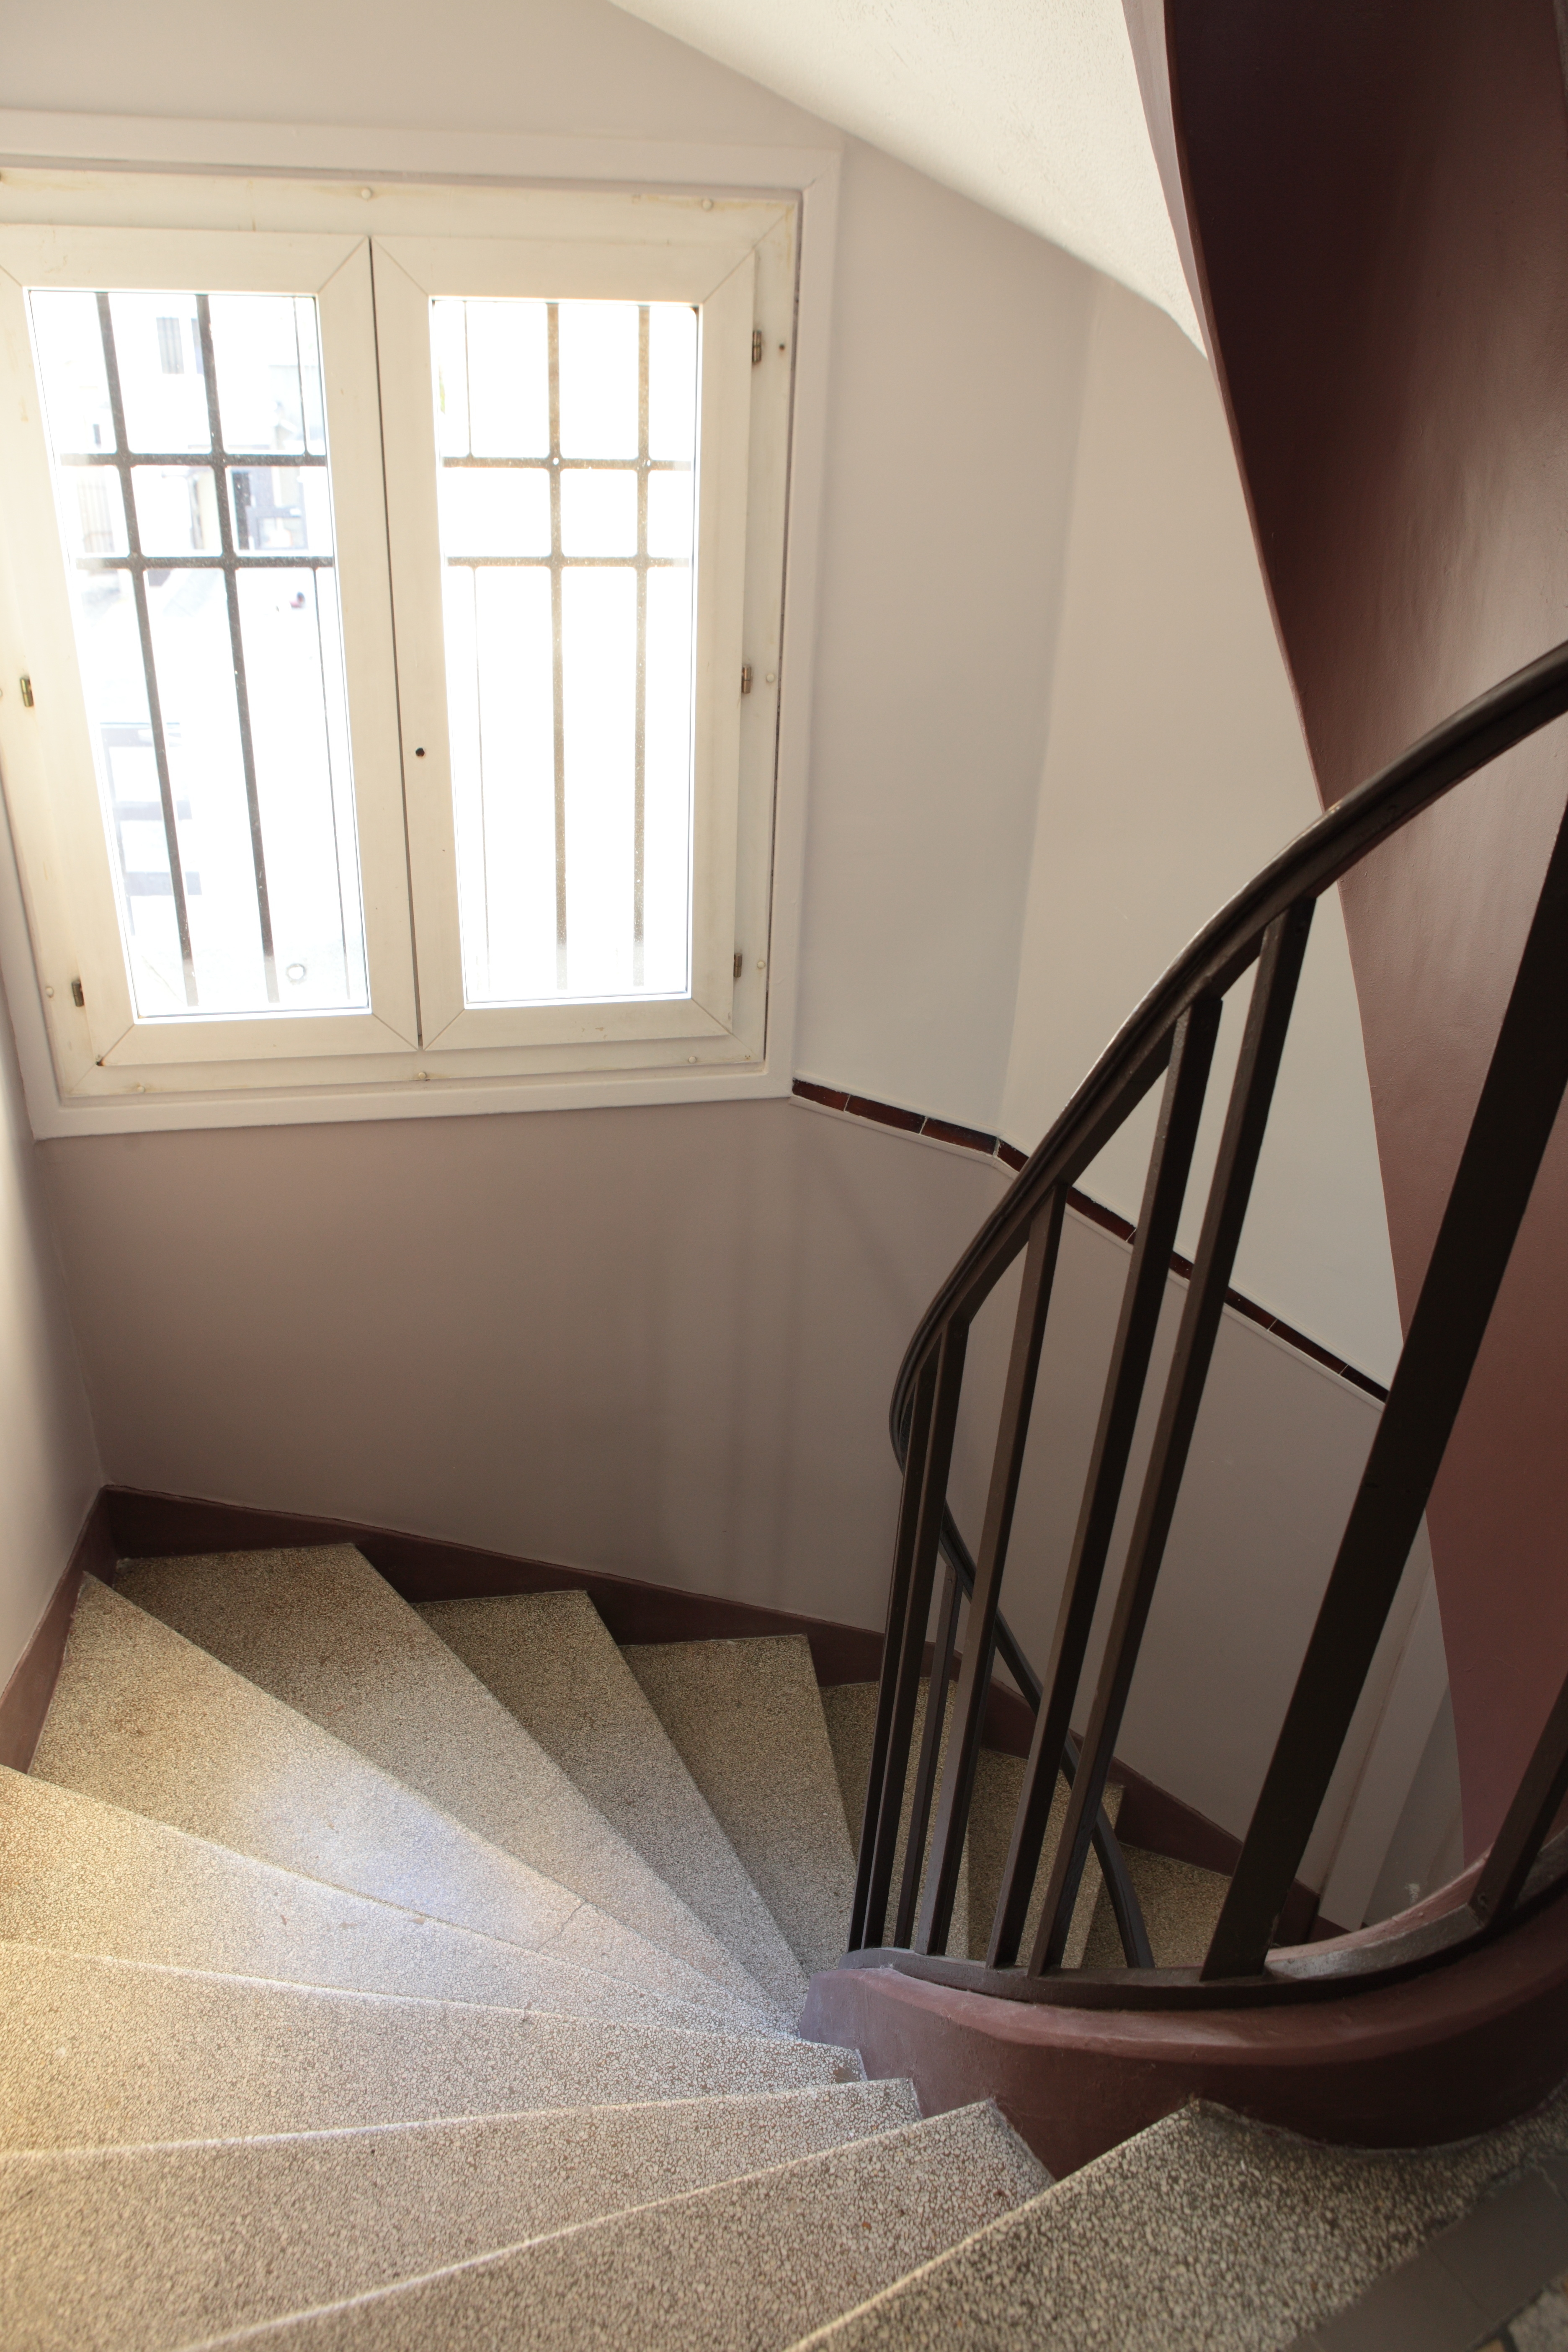 Papier Peint Montee Escalier Gallery Of Sacsdivers With